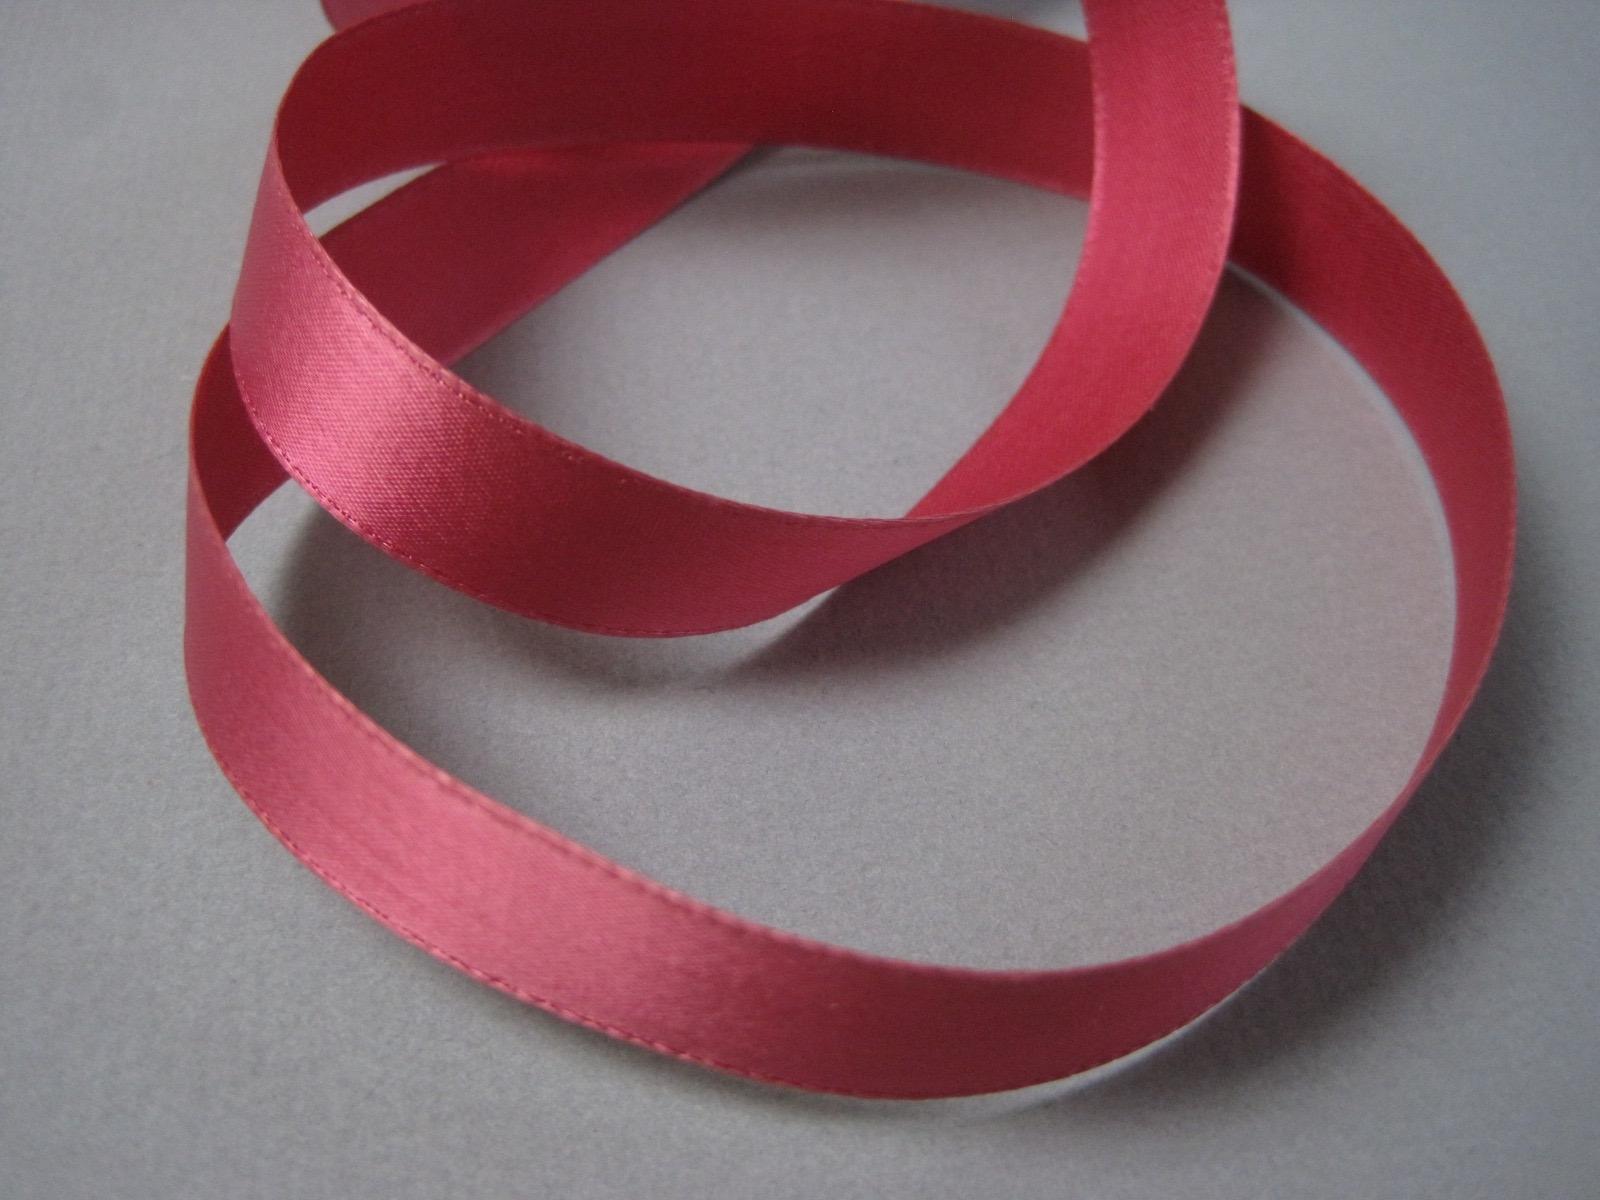 Rose Pink Satin Ribbon Rayon Fabrication 5 8 Inch Wide